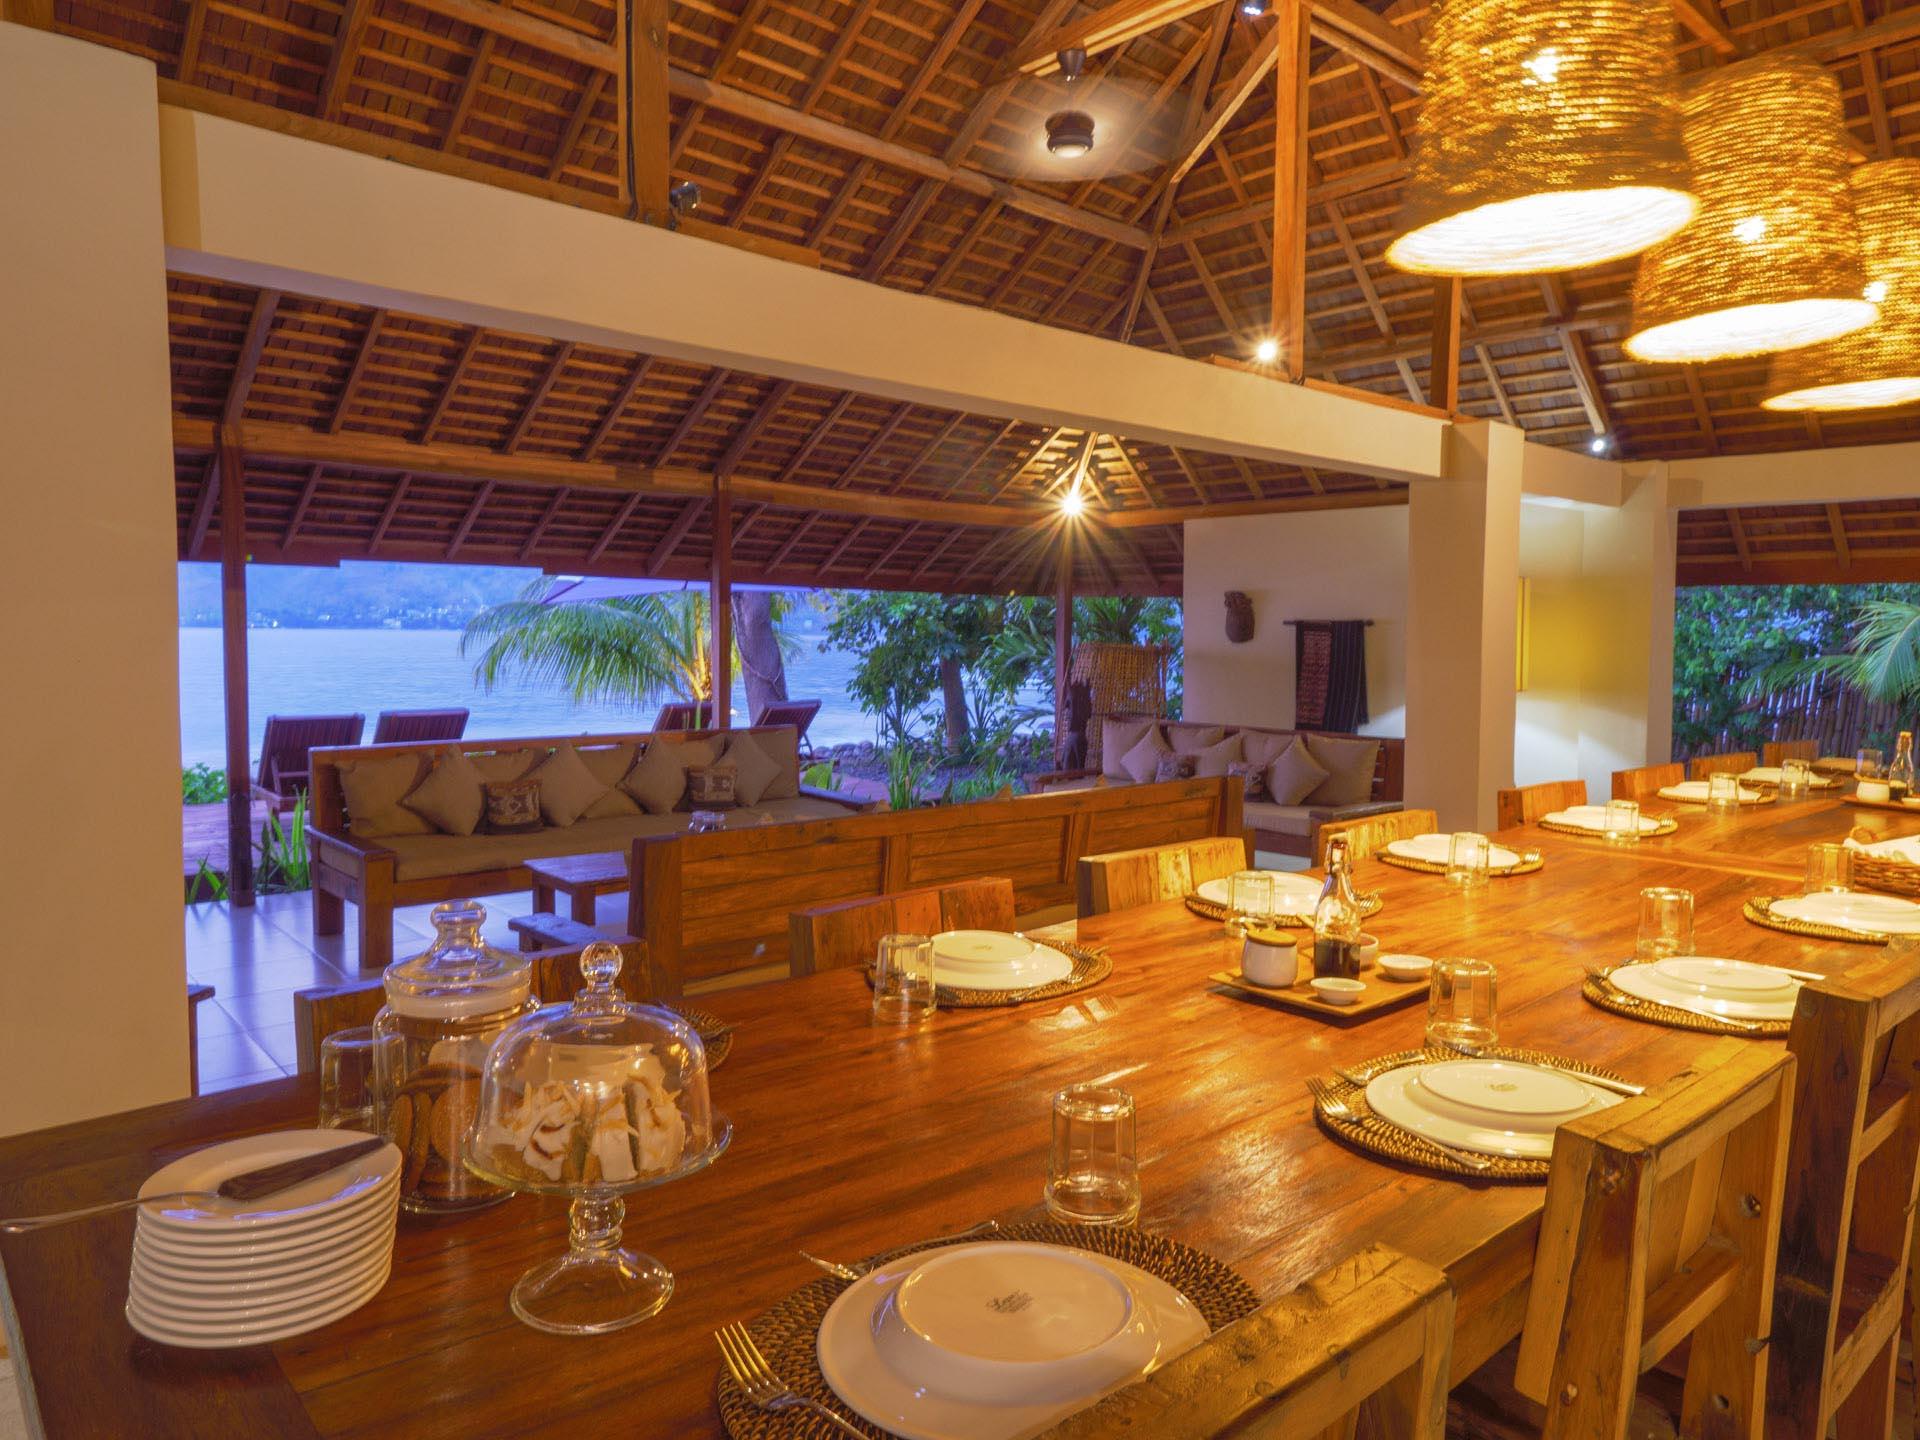 Alami Alor Resort's dining room